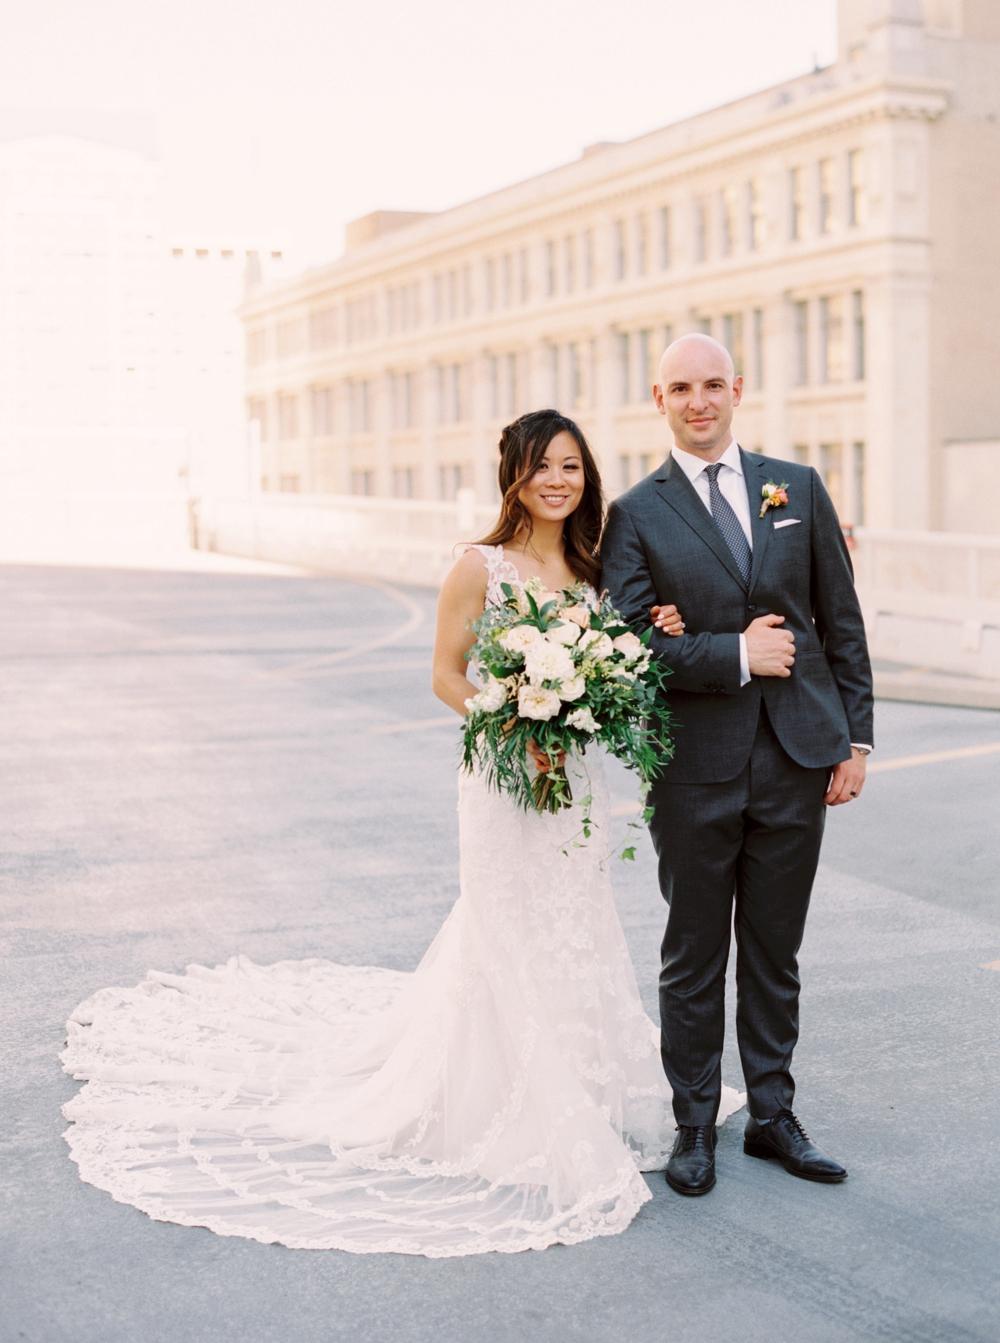 Calgary Wedding Photographer | Meadow Muse Pavilion Wedding | Canmore Photographers | Fish Creek Park | Bride and groom